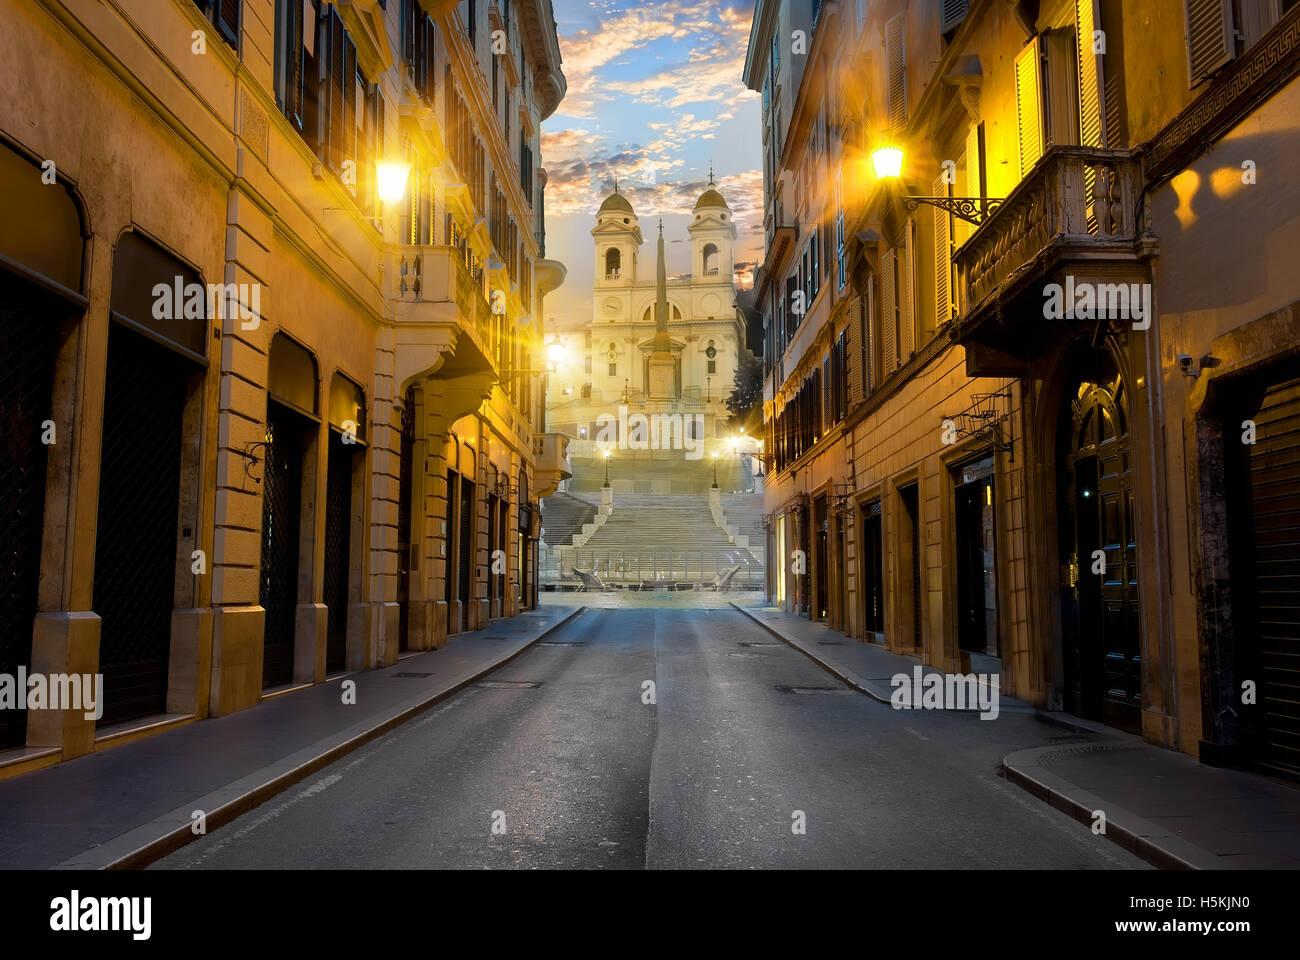 Rue avec road to Spanish escaliers à Rome, Italie Photo Stock